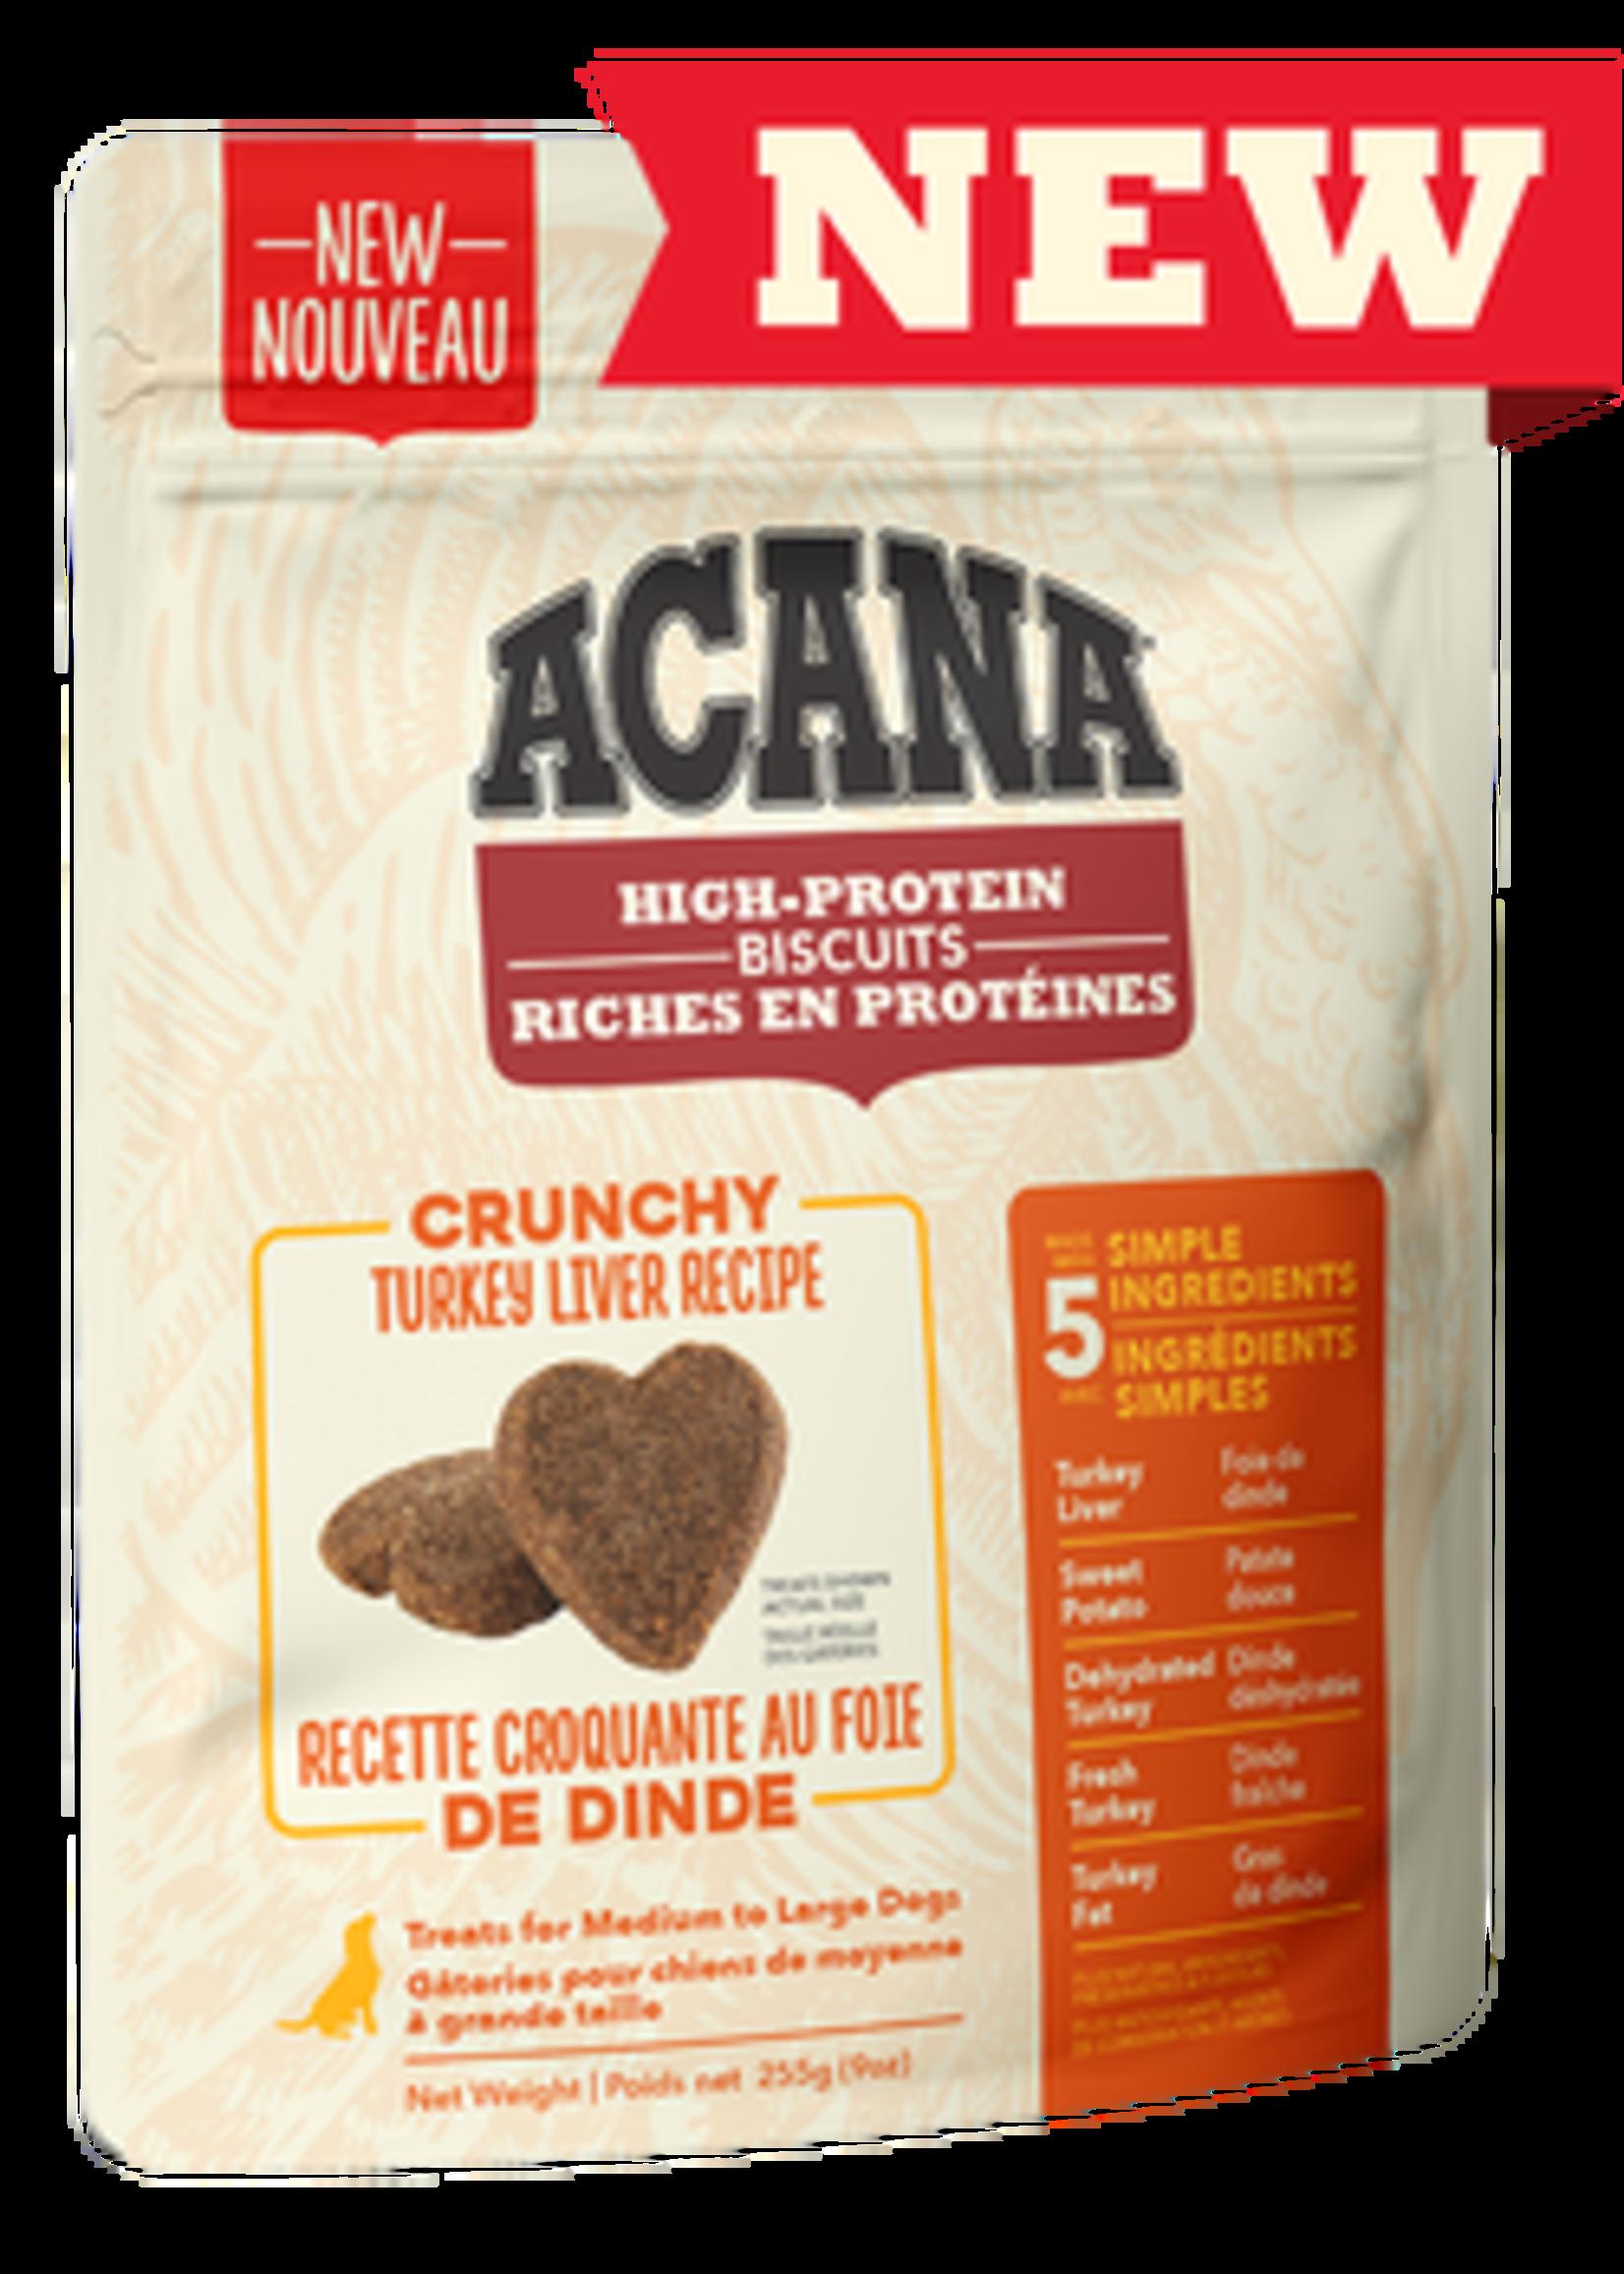 Acana® Acana High-Protein Biscuits, Crunchy Turkey Liver Recipe 9oz Large